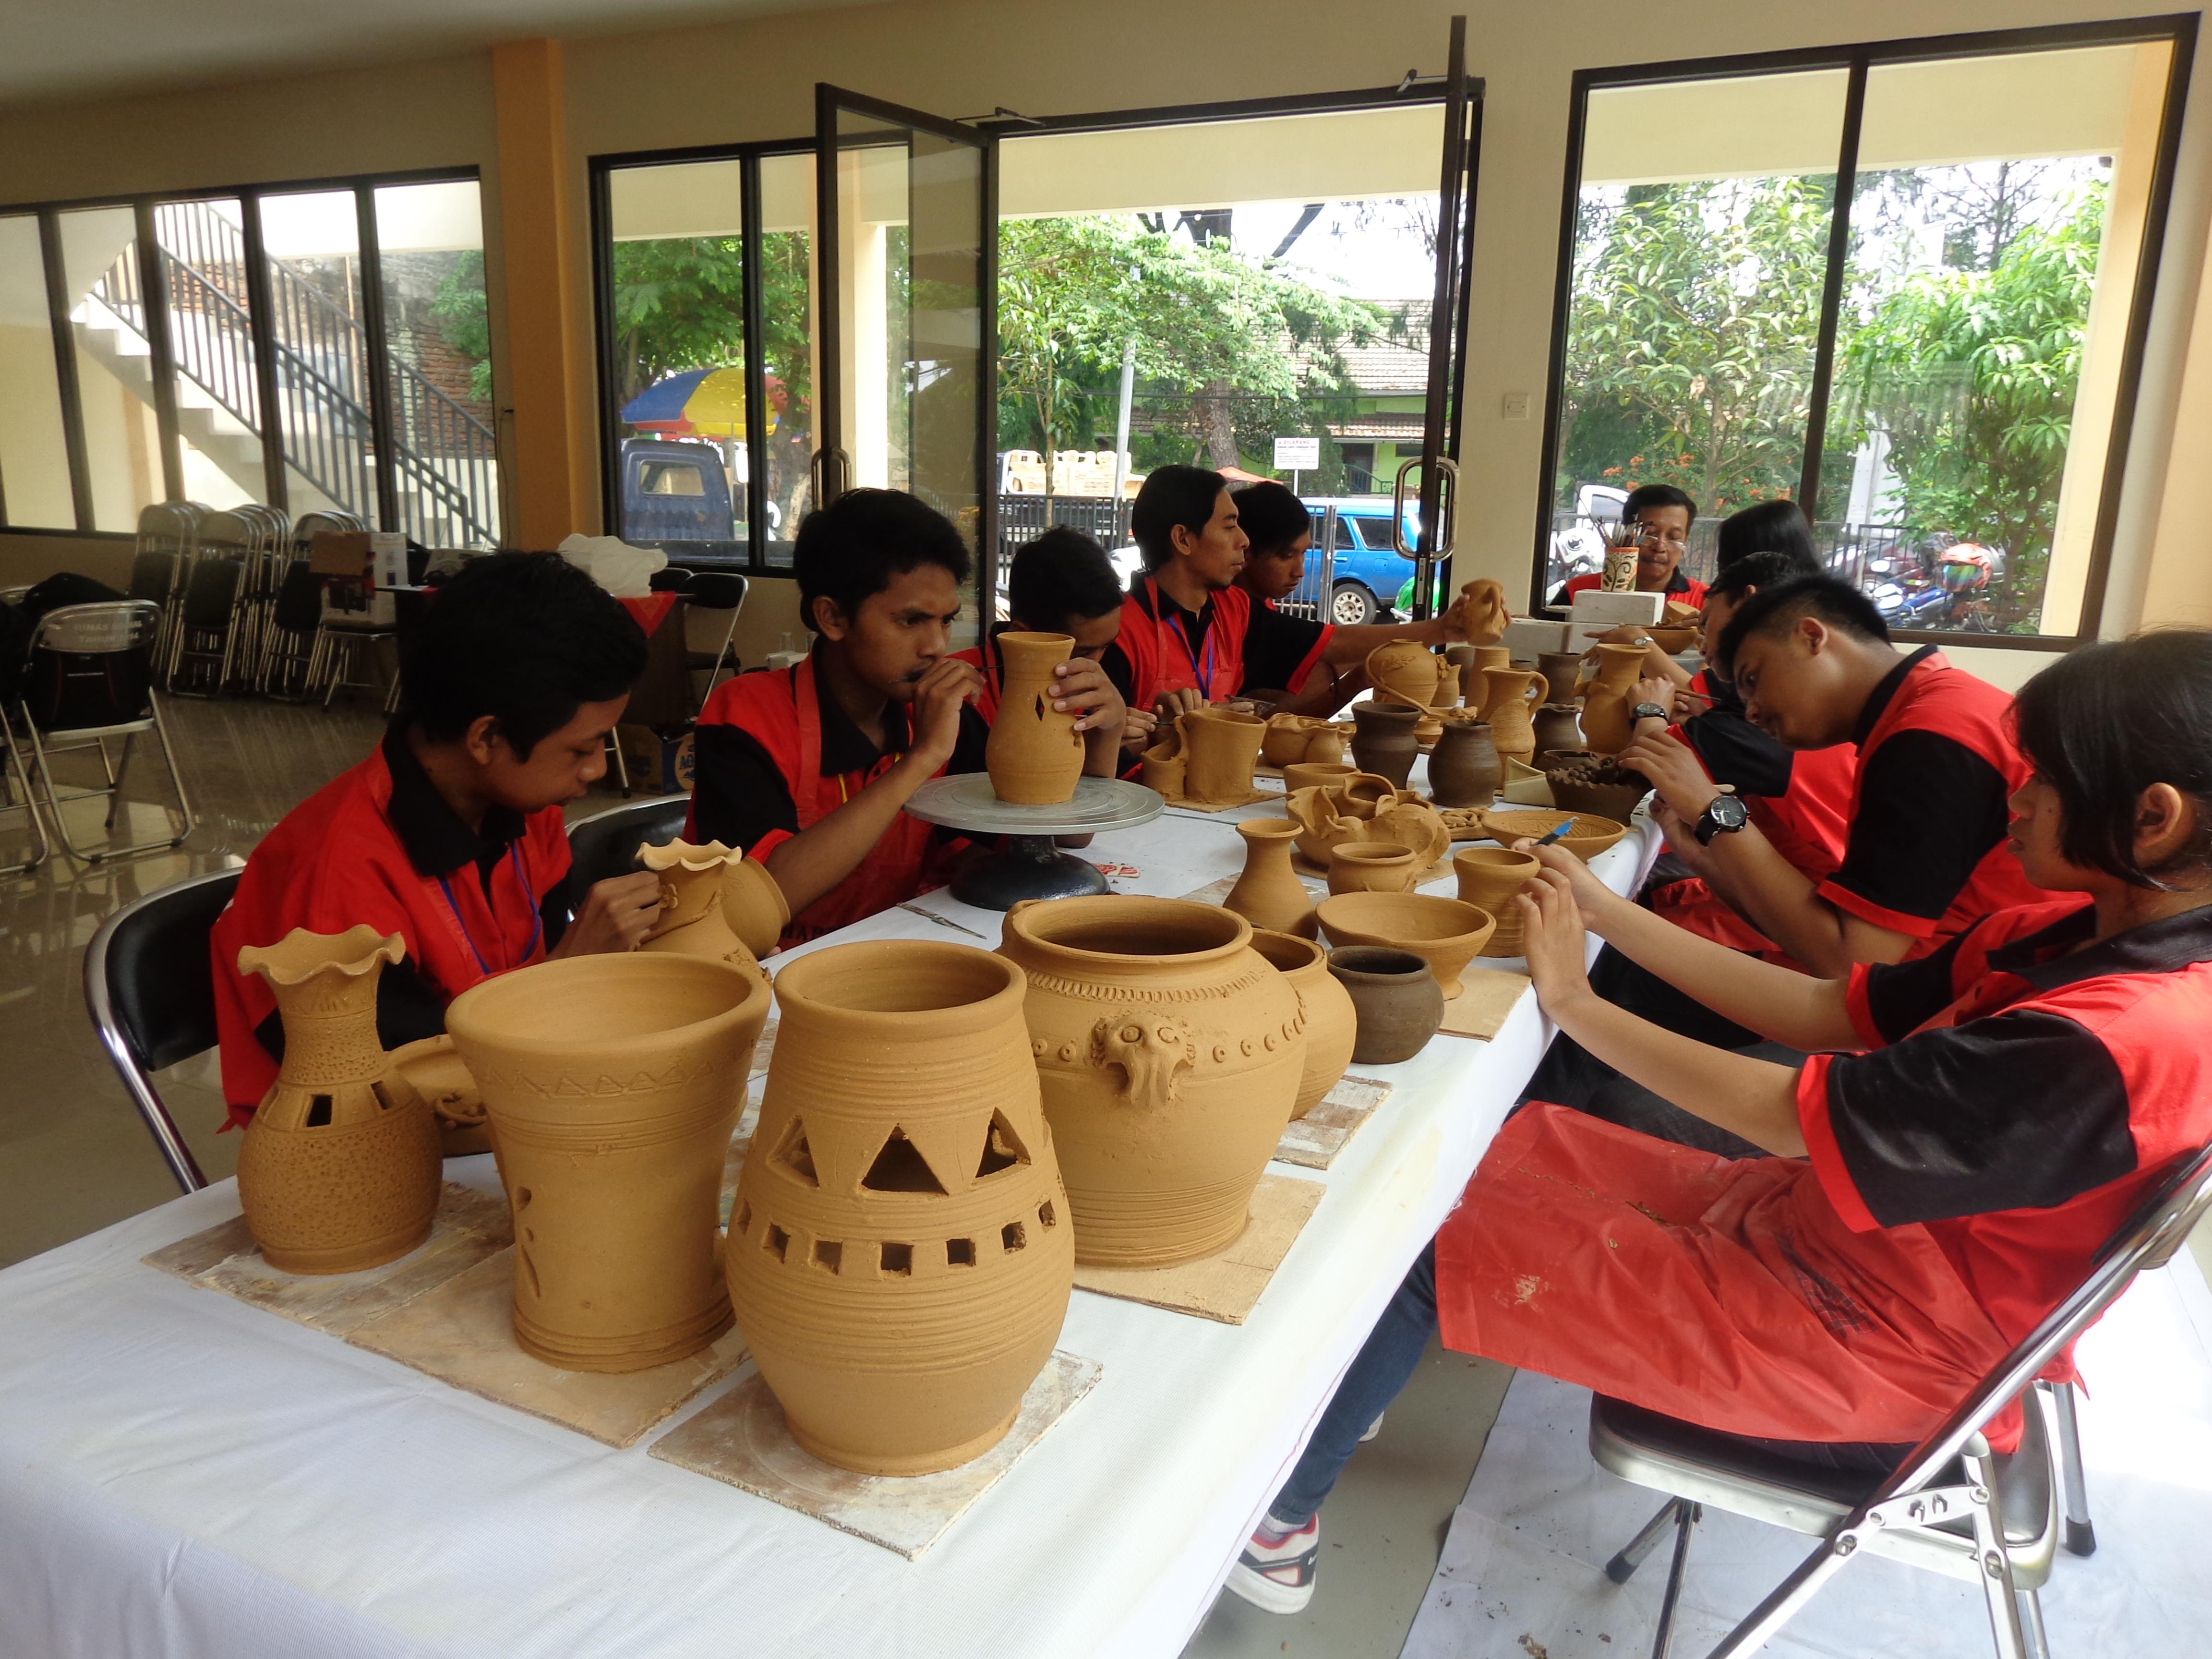 Malang Pun Miliki Kerajinan Khasnya Ngalam Pembuatan Keramik Khas Kampung